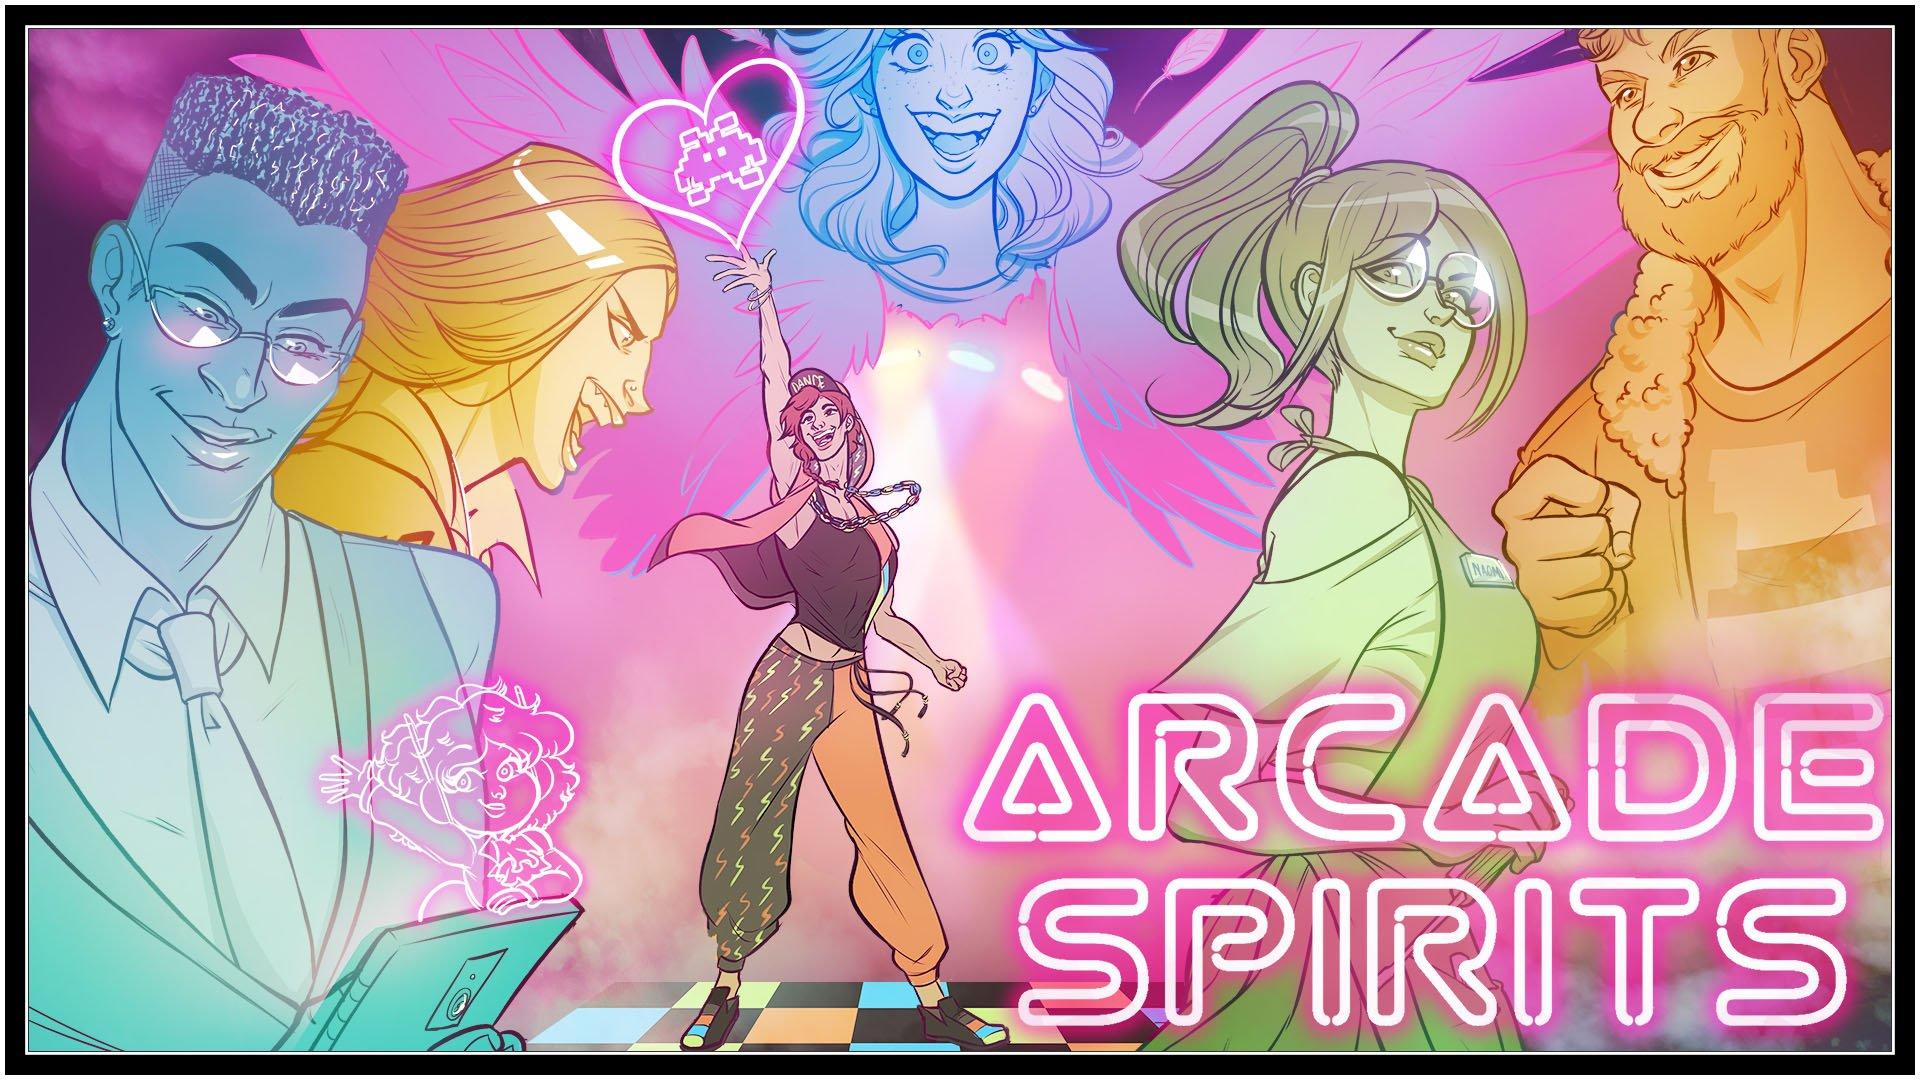 Arcade Spirits Fi3